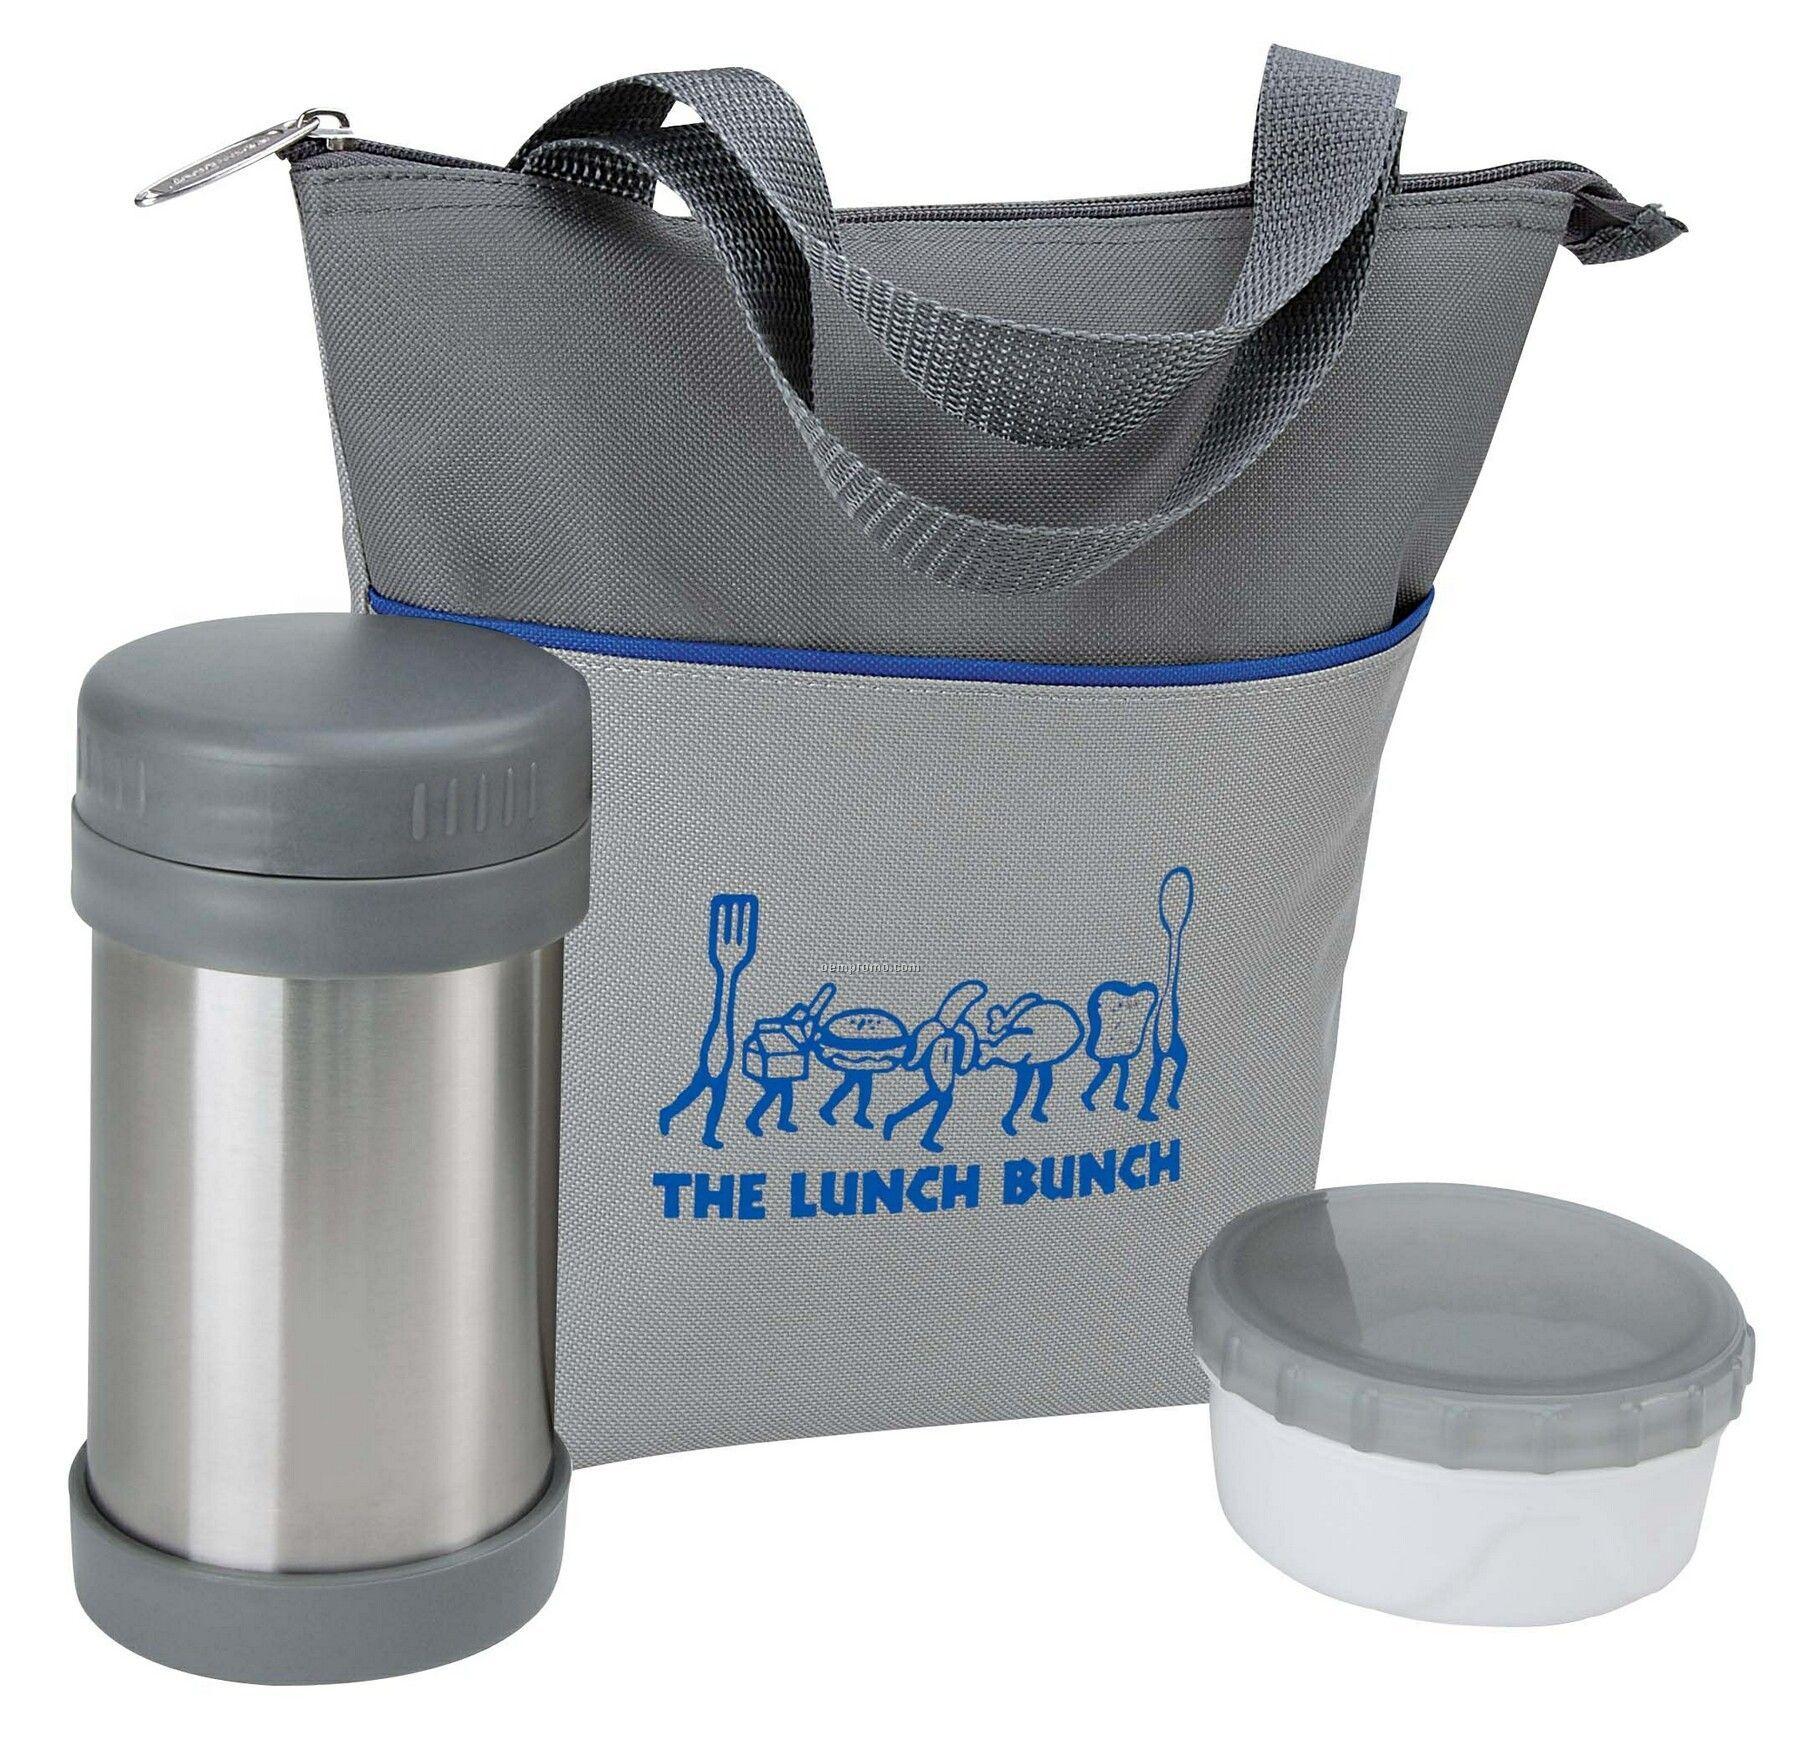 Rcc Koozie Lunch Bag Set W/ Storage Containers